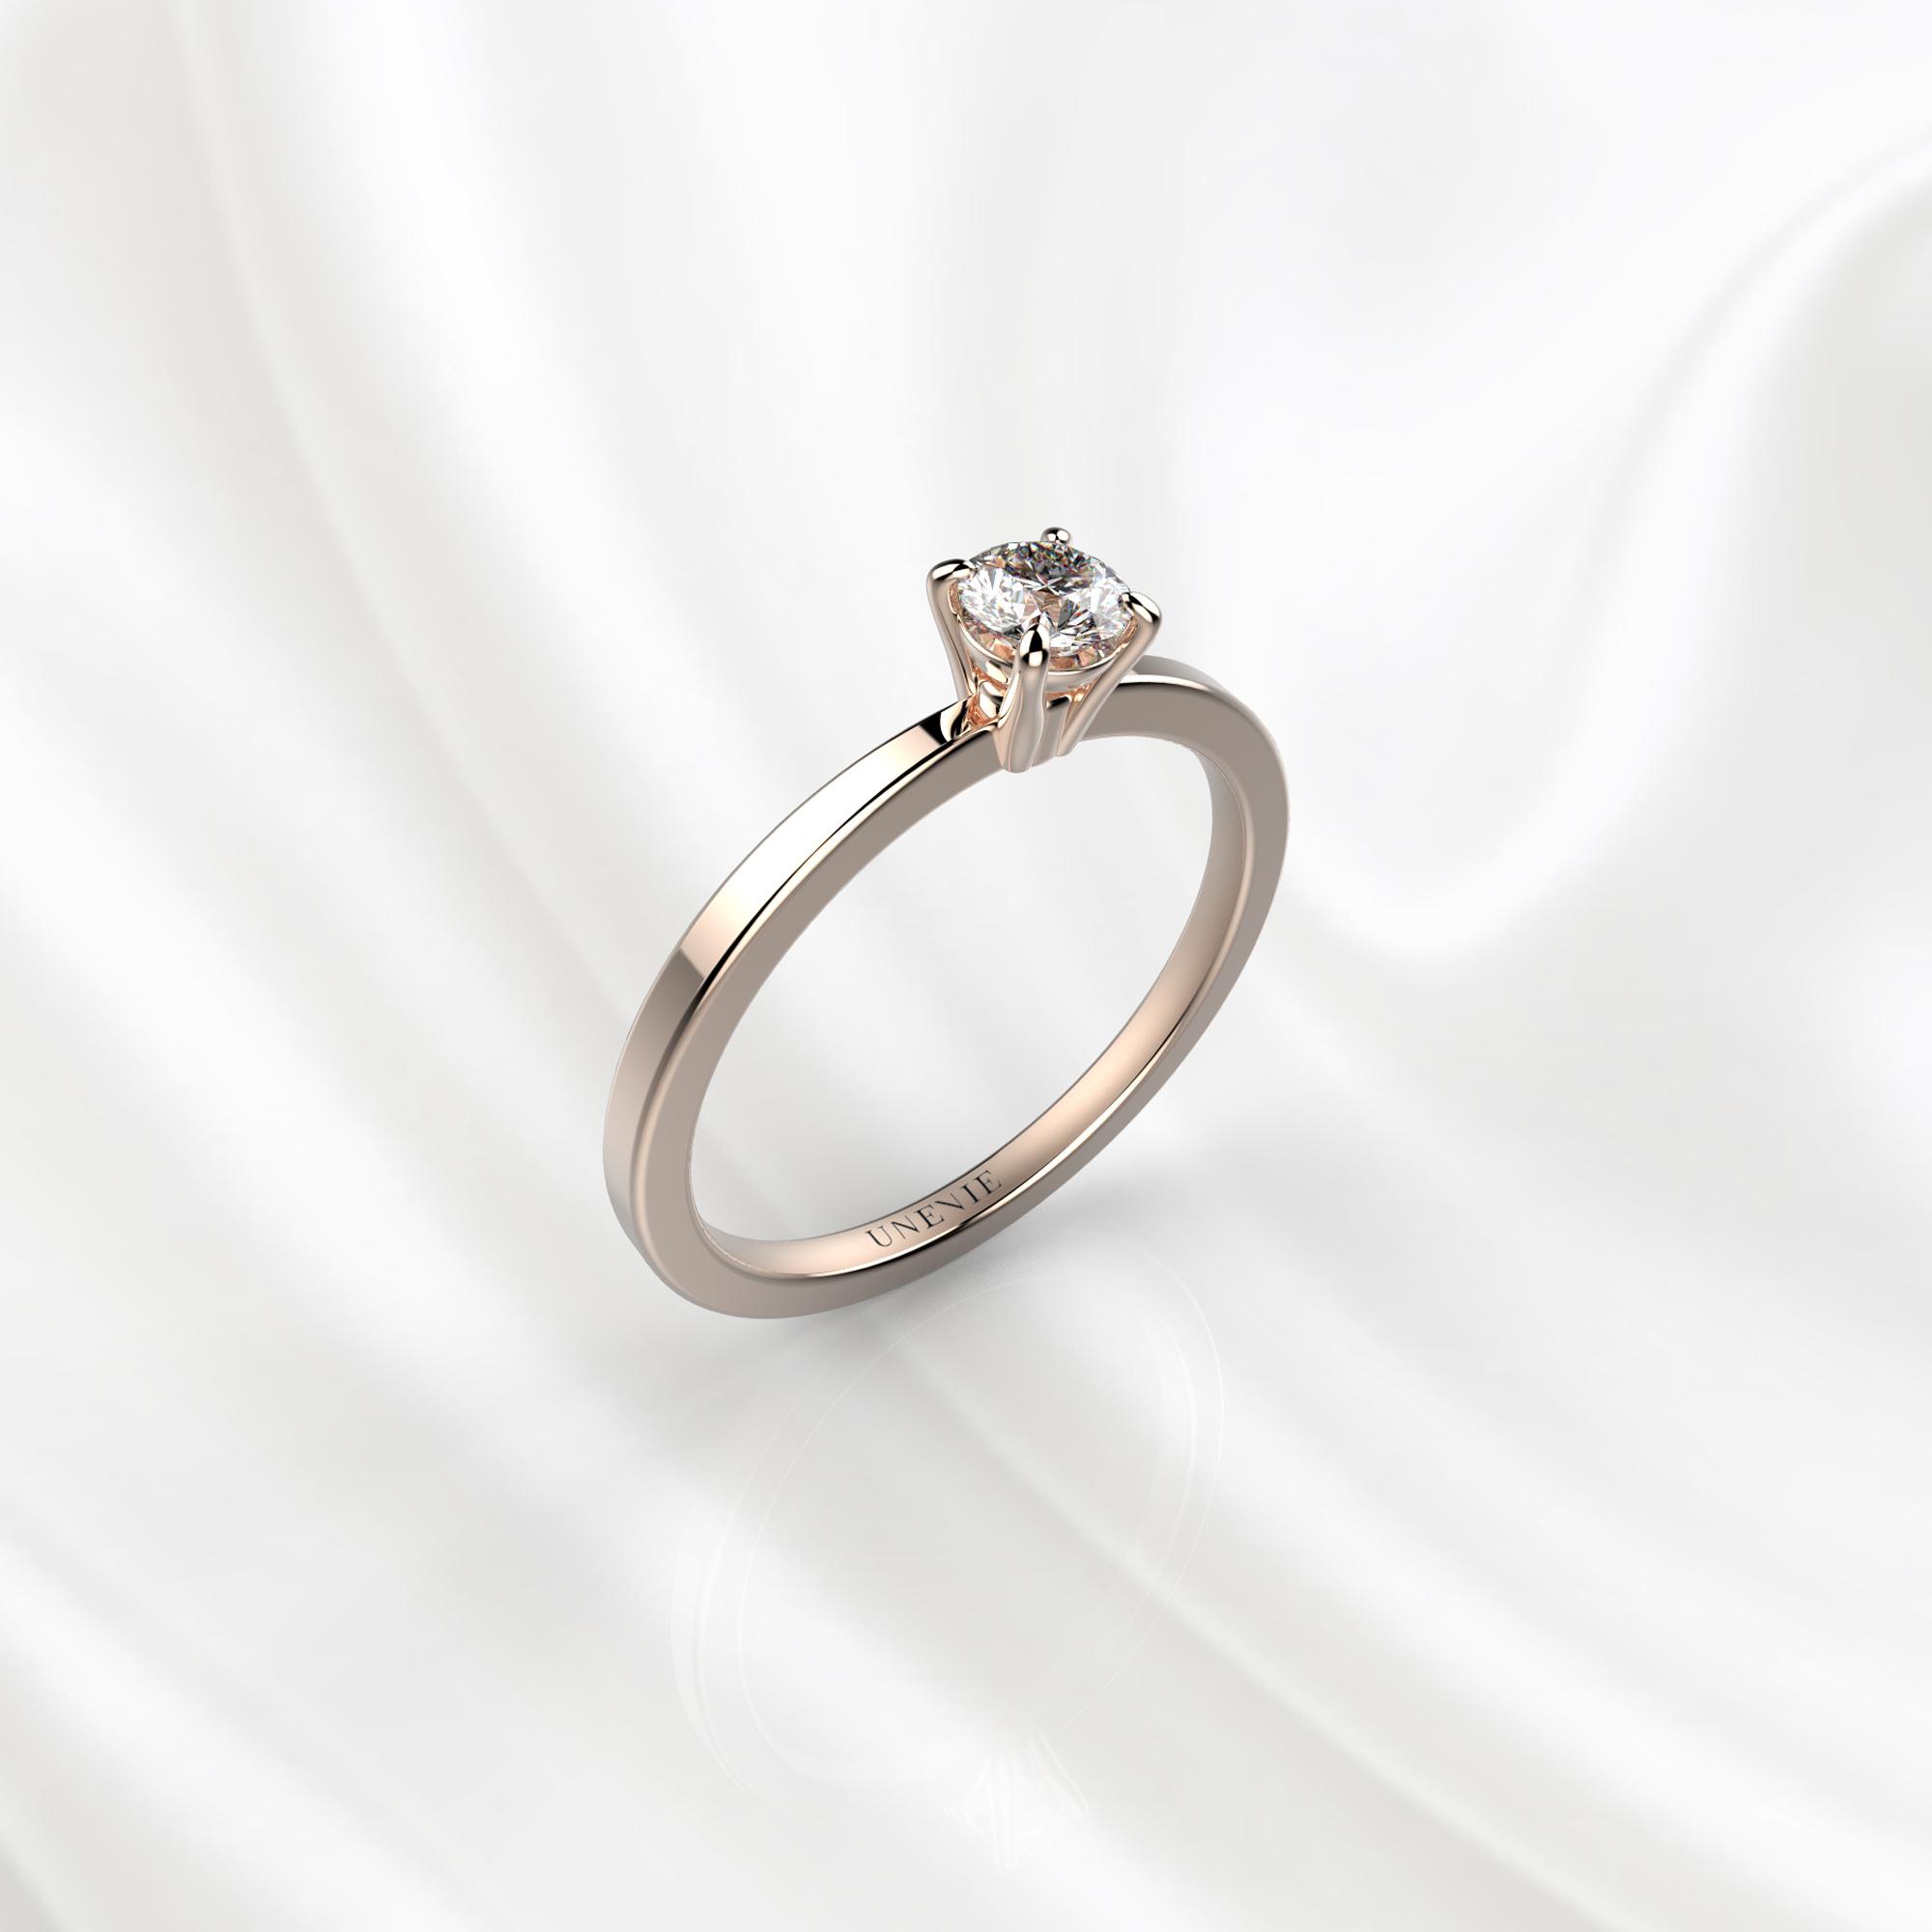 N22 Помолвочное кольцо из розового золота с бриллиантом 0.16 карат